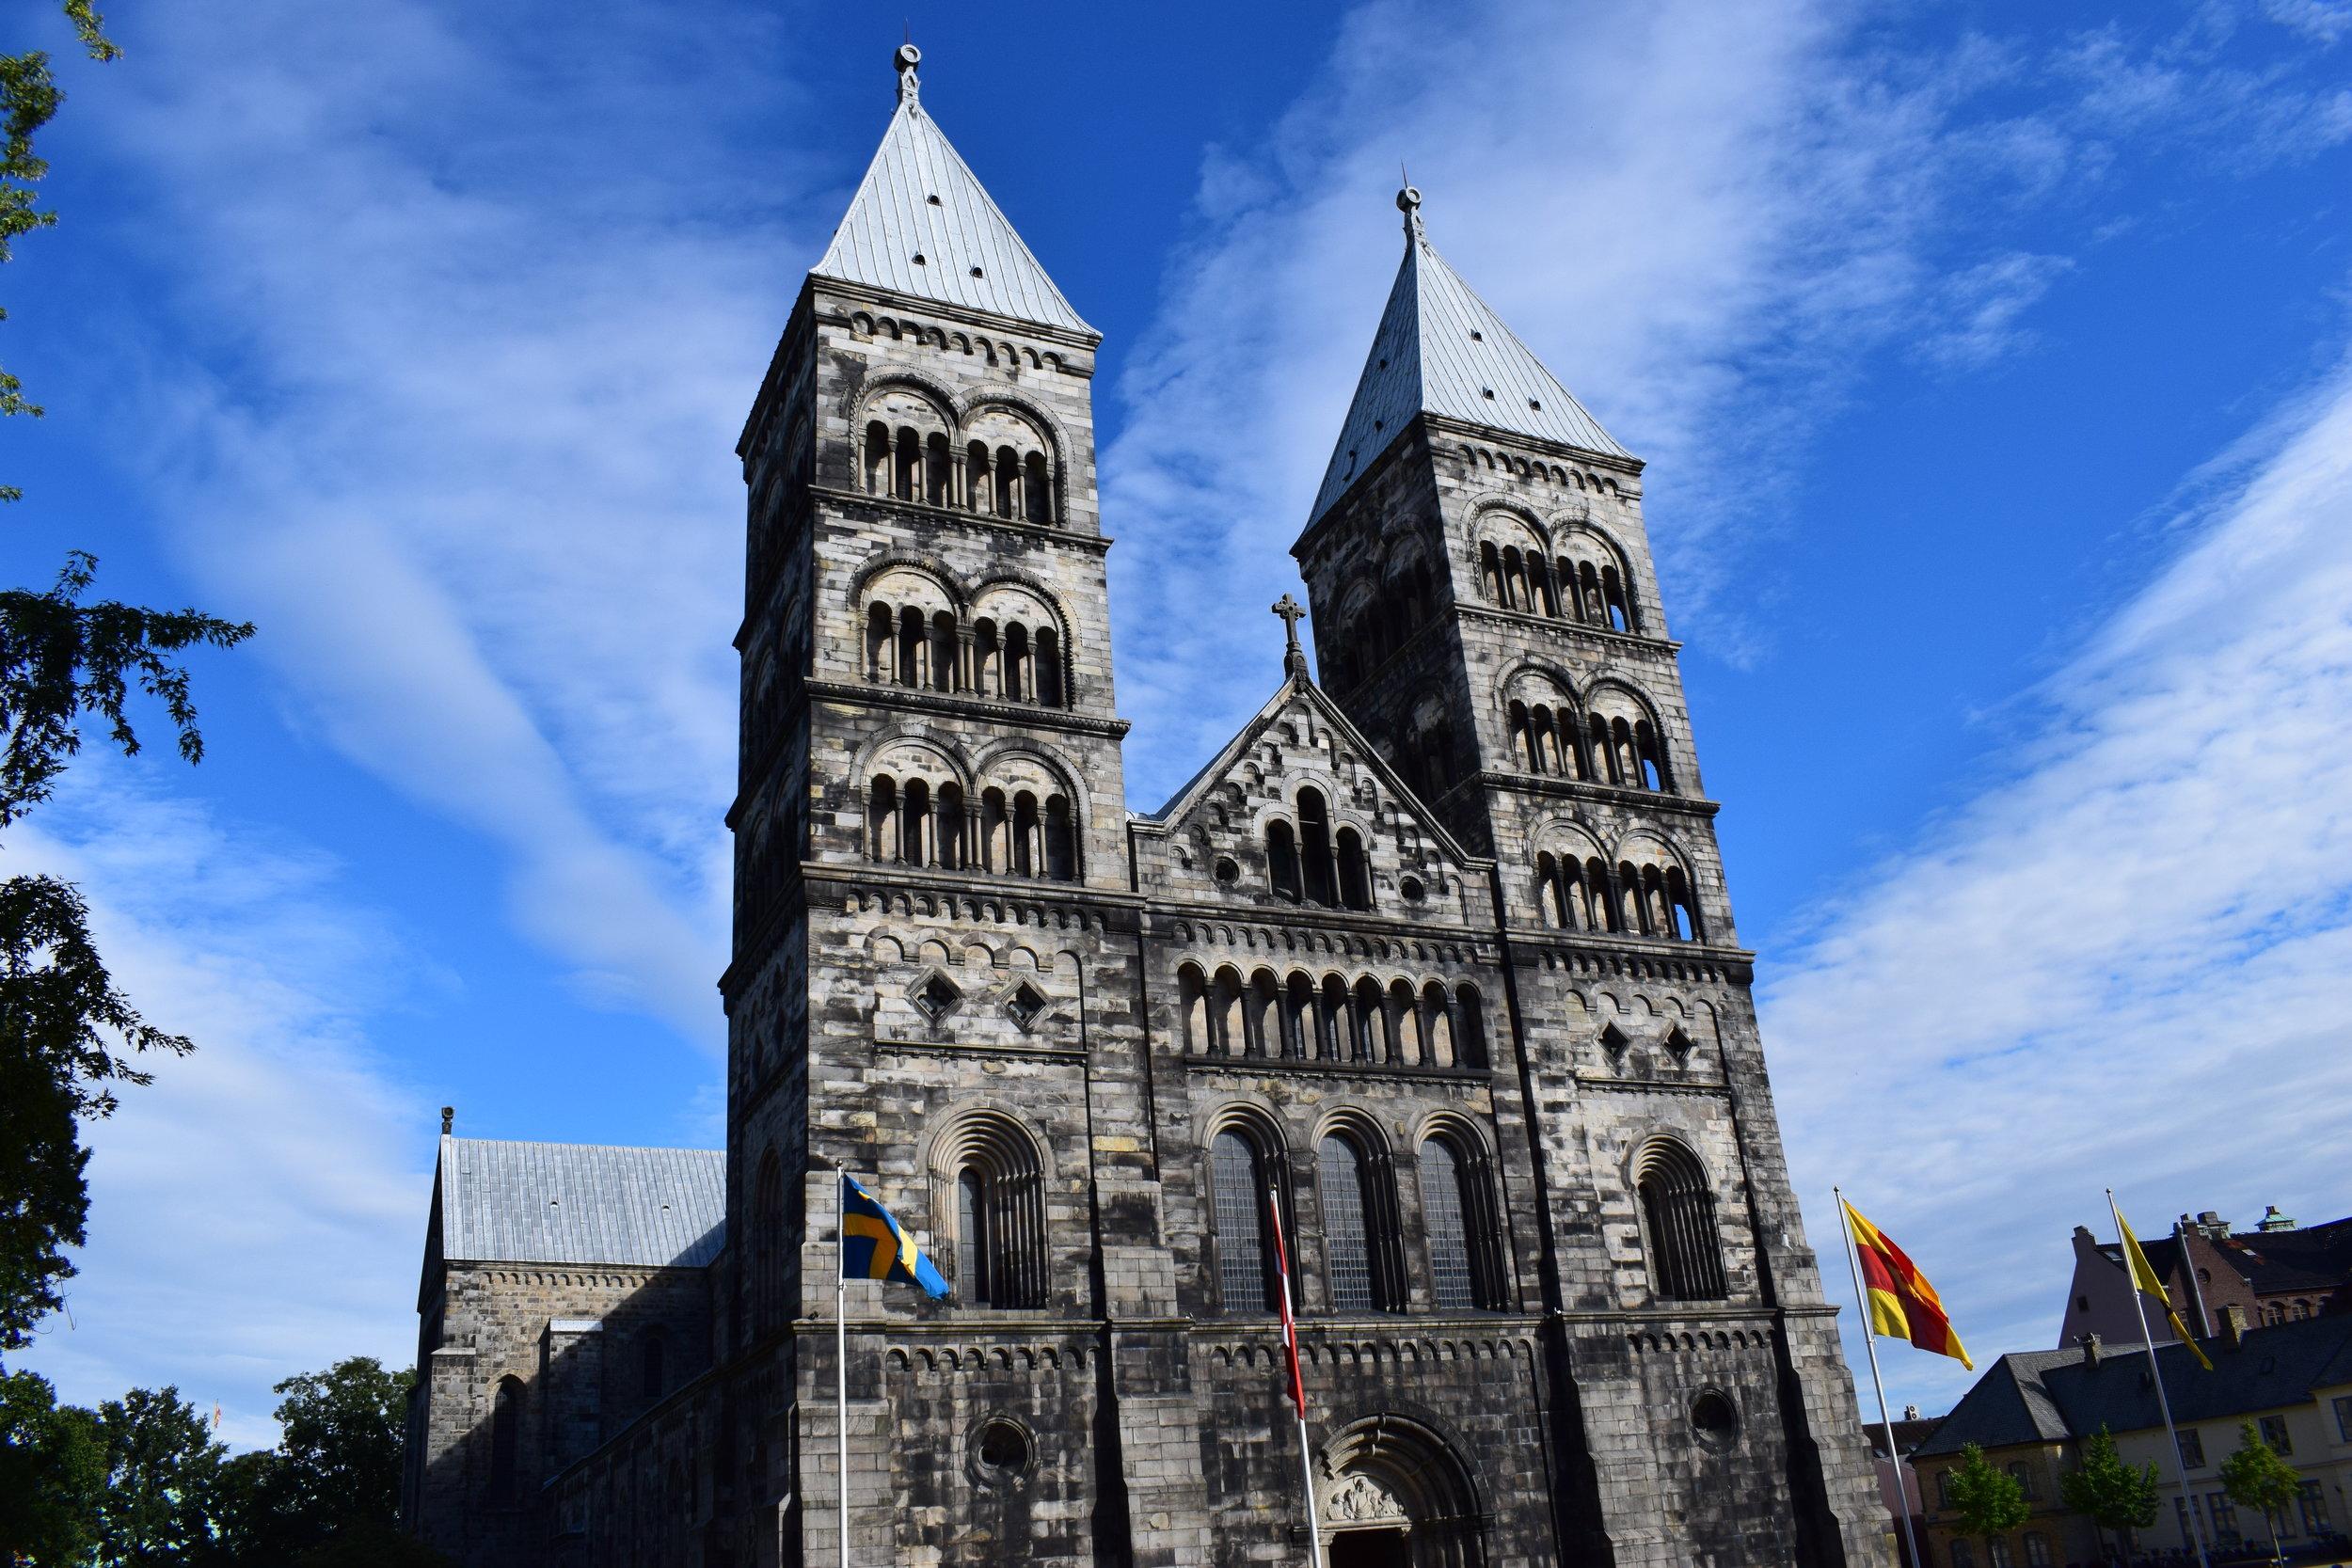 lund cathedral, 11th-12th century, Lund